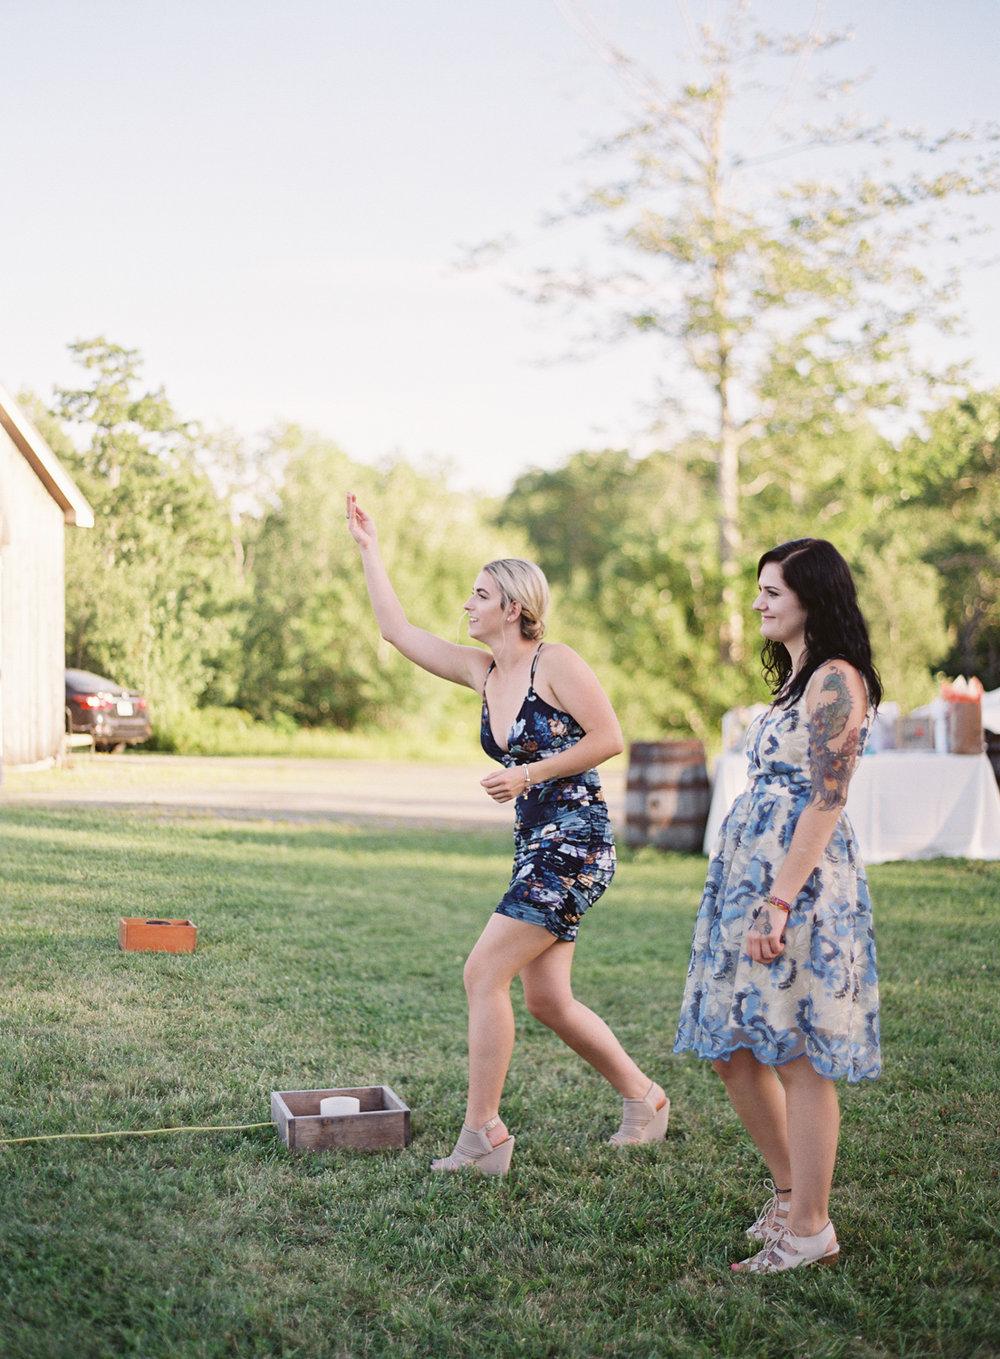 Jacqueline Anne Photography - Nova Scotia Backyard Wedding-58.jpg